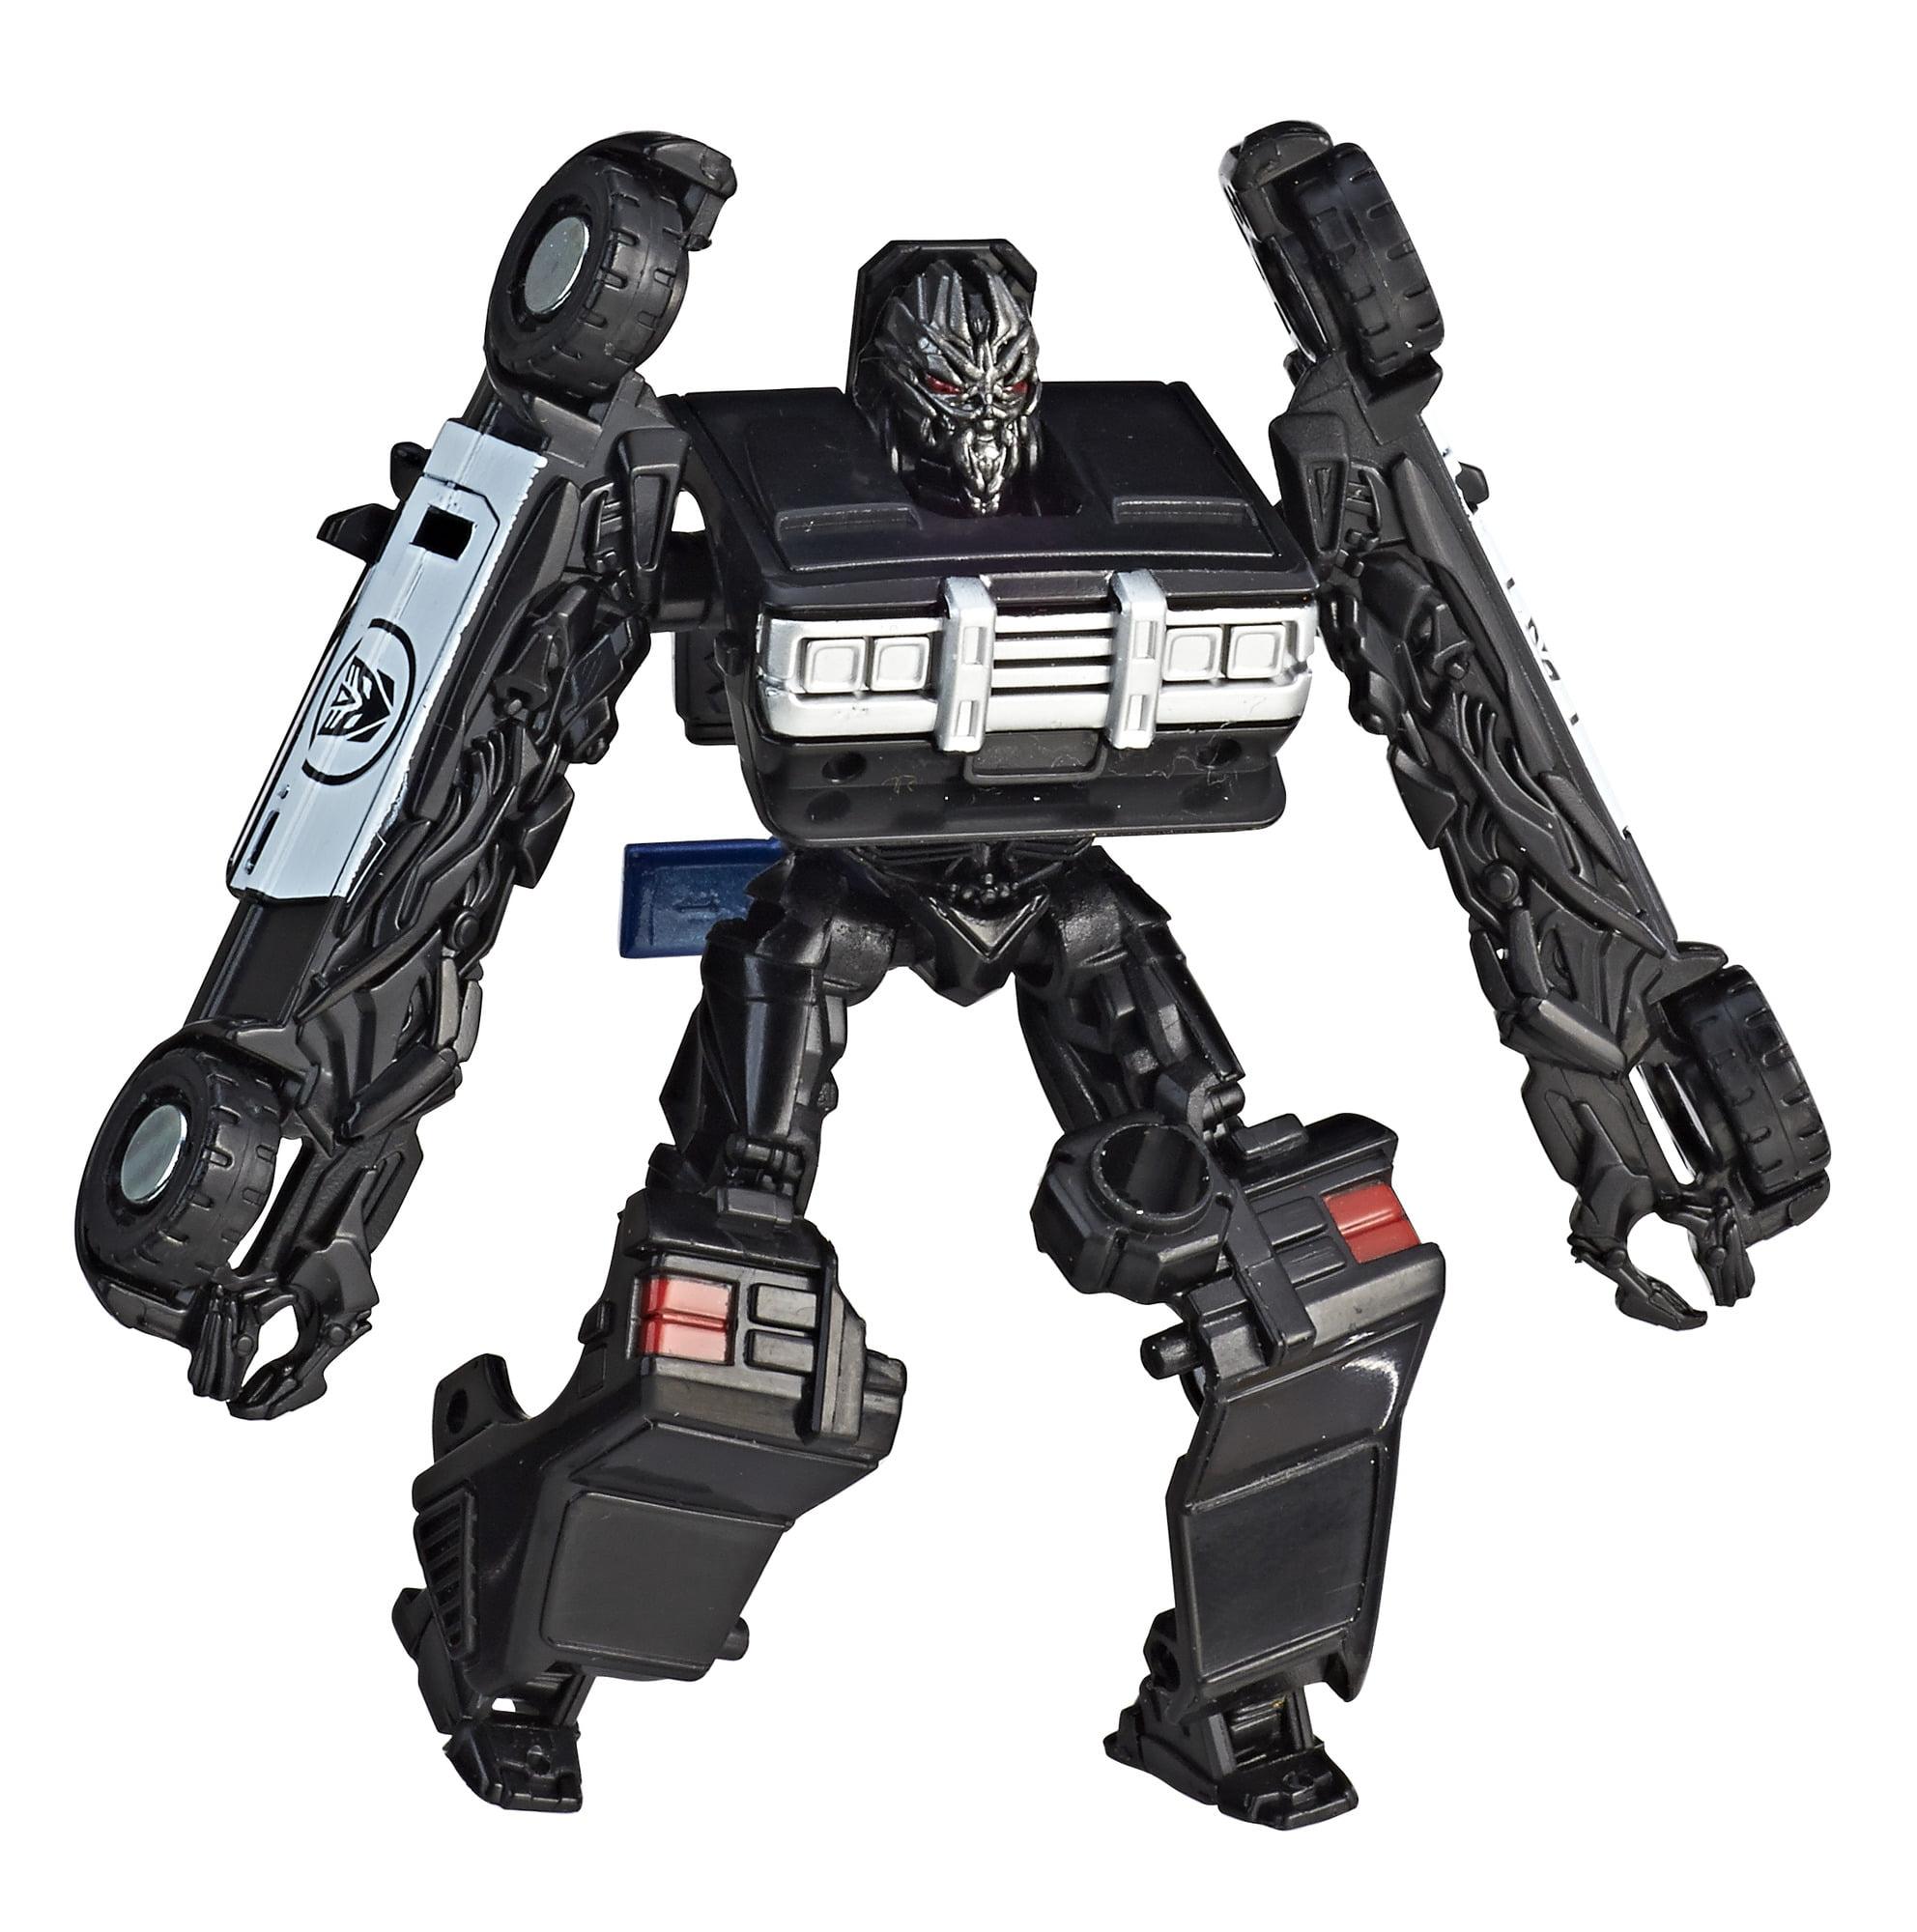 Transformers Bumblebee - Energon Igniters Speed Series Barricade